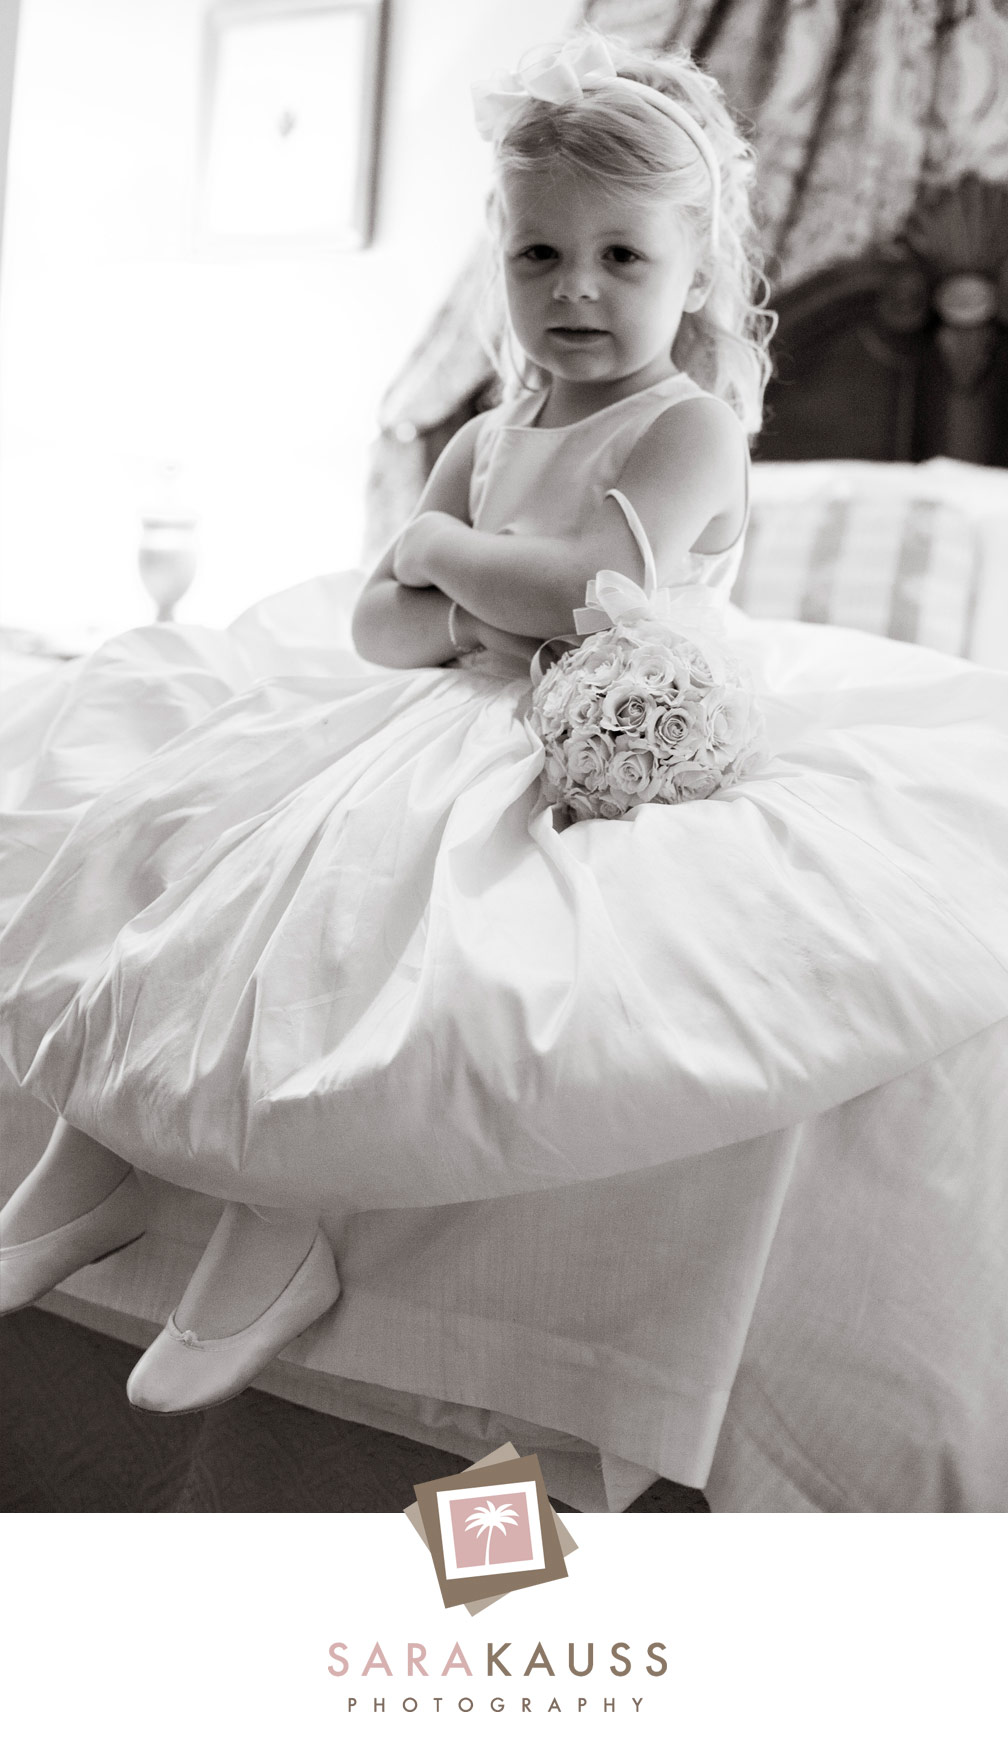 e8550a5ac2 boca-resort-wedding 5-flower-girl - Sara Kauss Photography